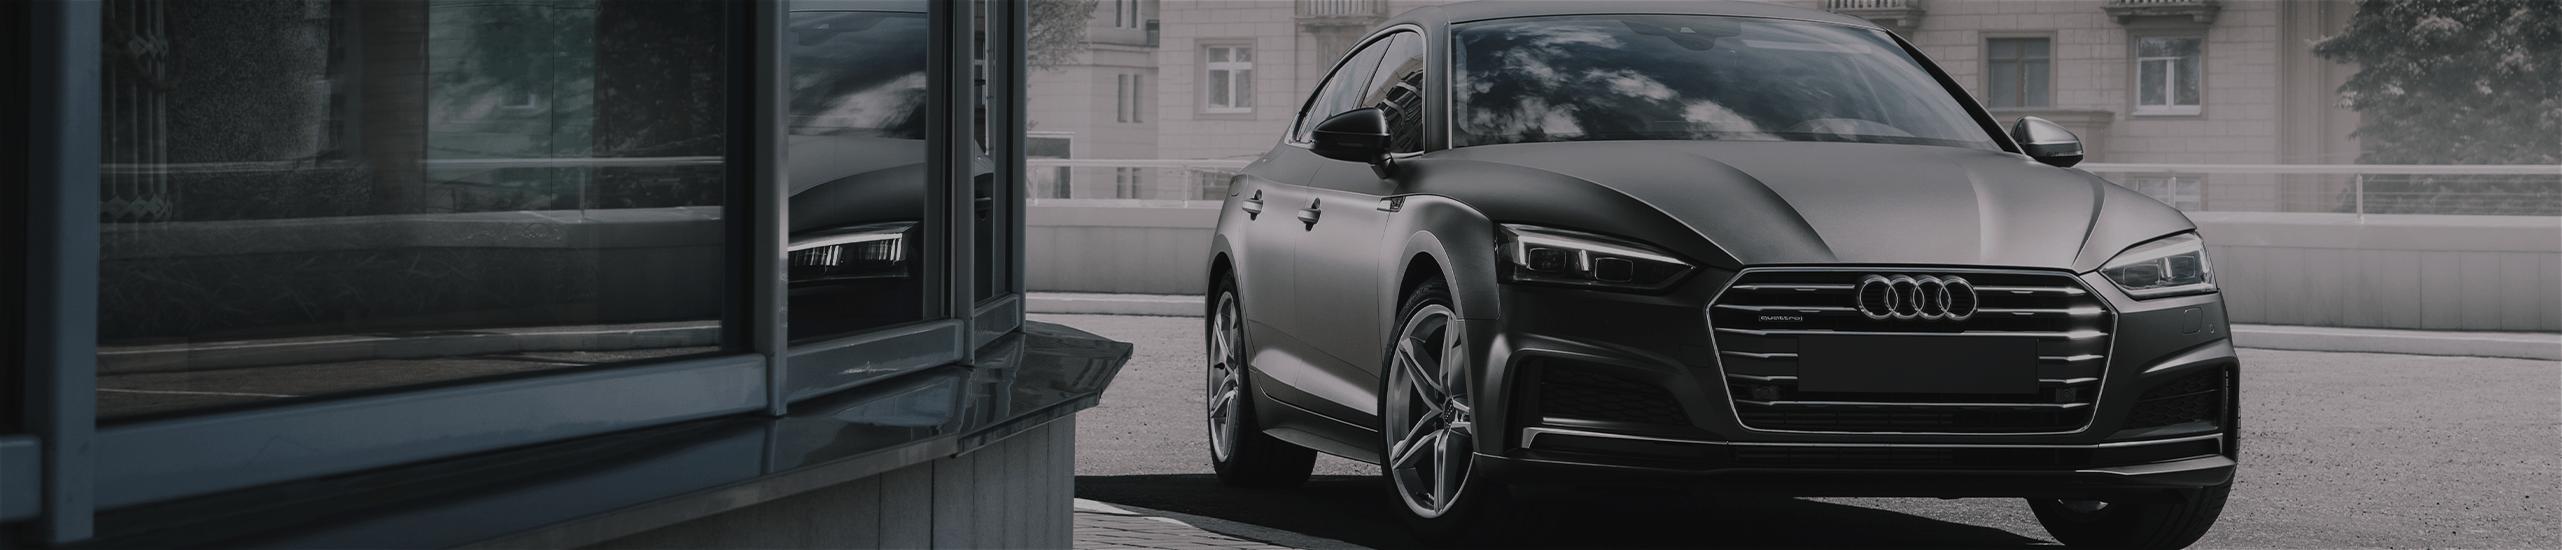 Audi Flexleasing Erhverv / Privat